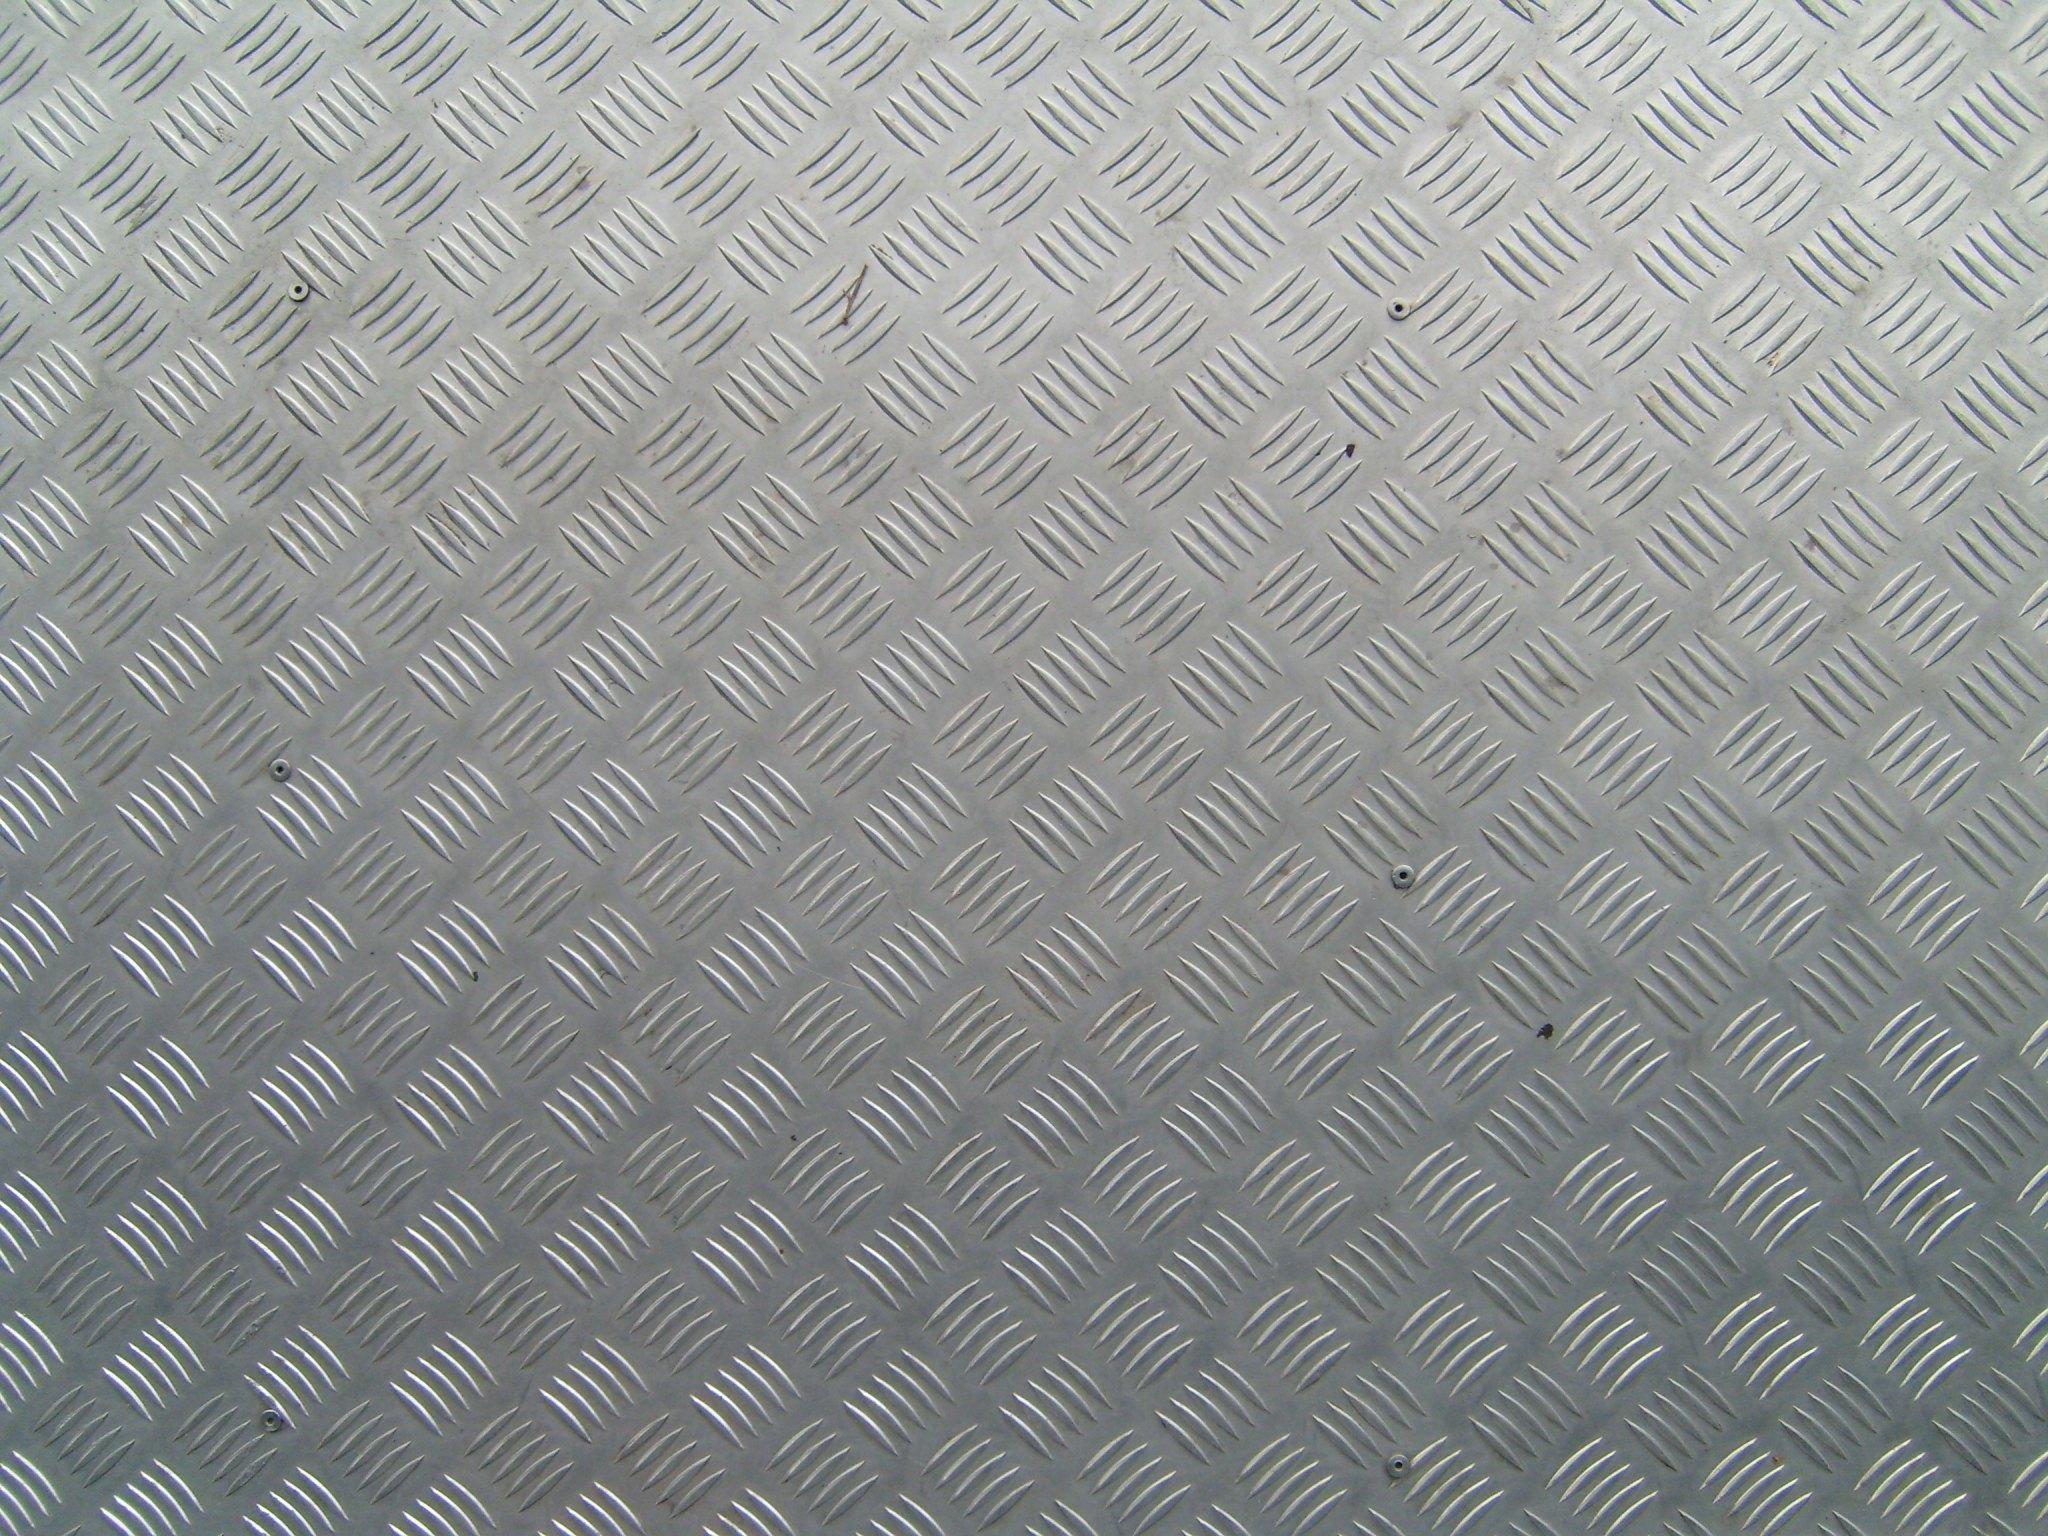 Https Commons Wikimedia Org Wiki File Slip Resistant Metal Tread Jpg